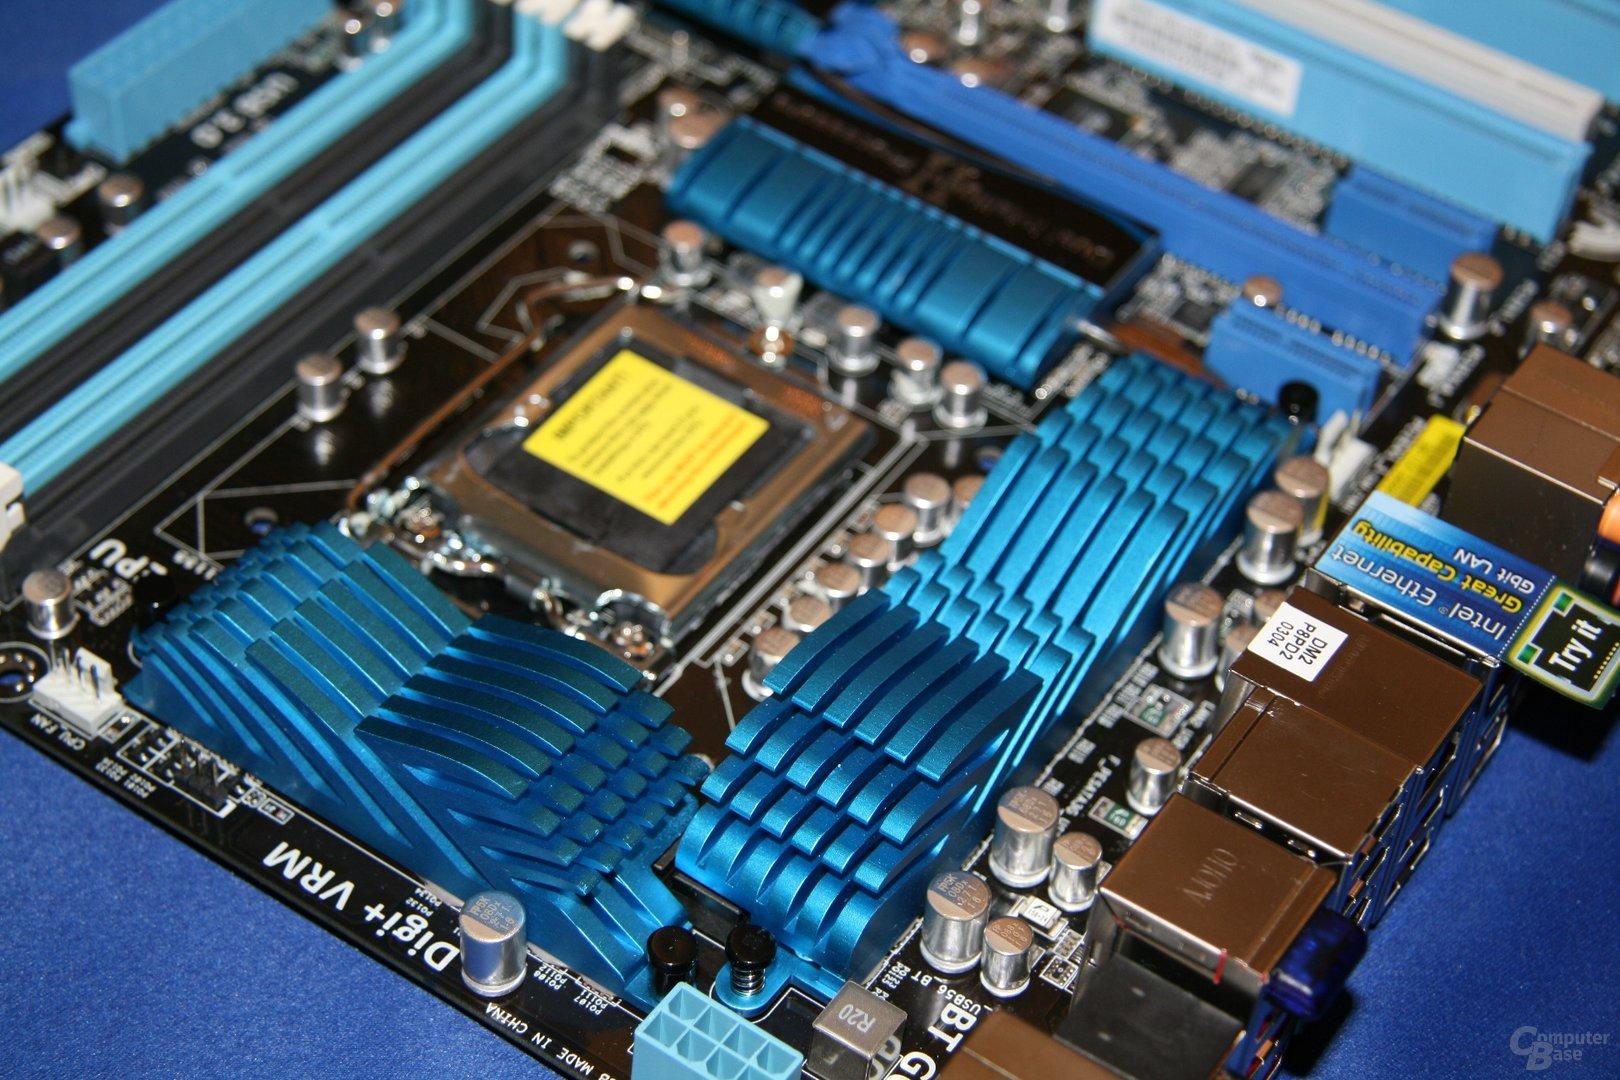 Asus P8P67 Deluxe